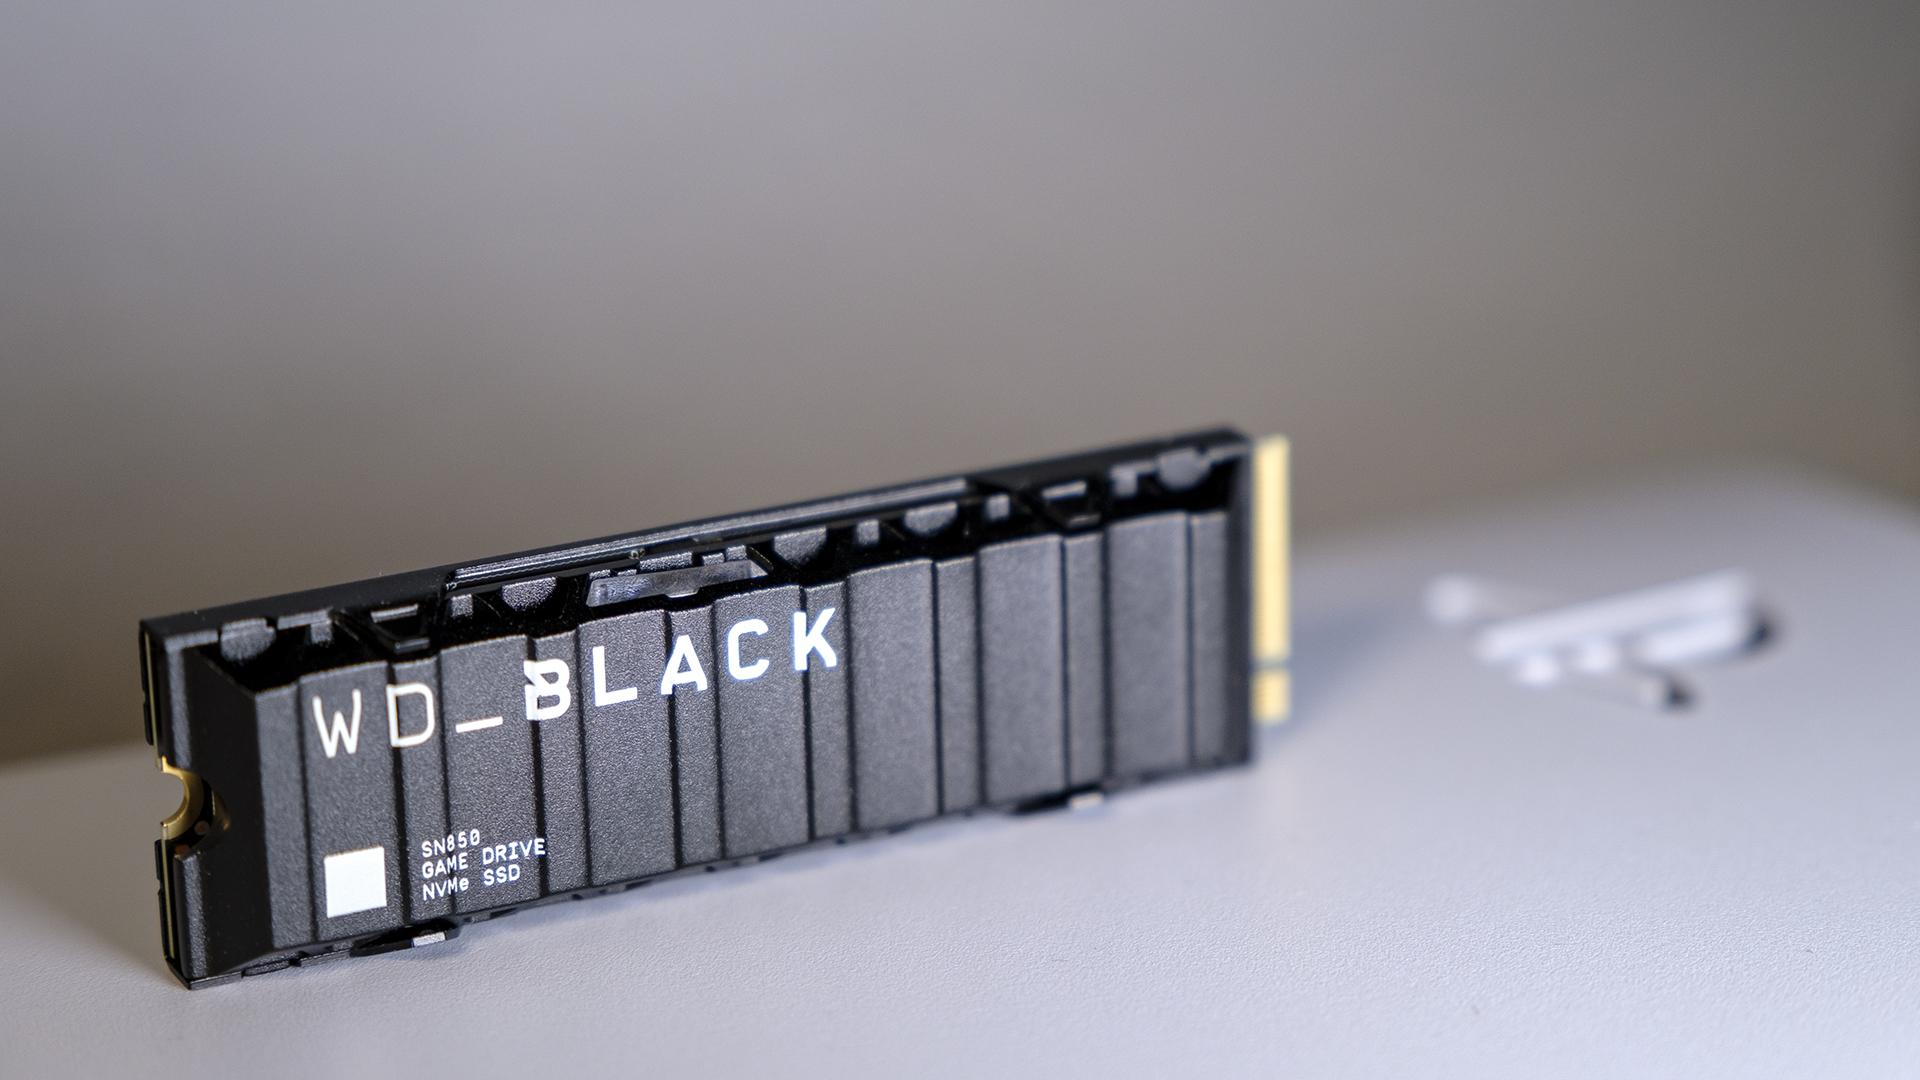 PlayStation 5 WD Black SN850 Game Drive PS5 Upgrade Zwischenbild